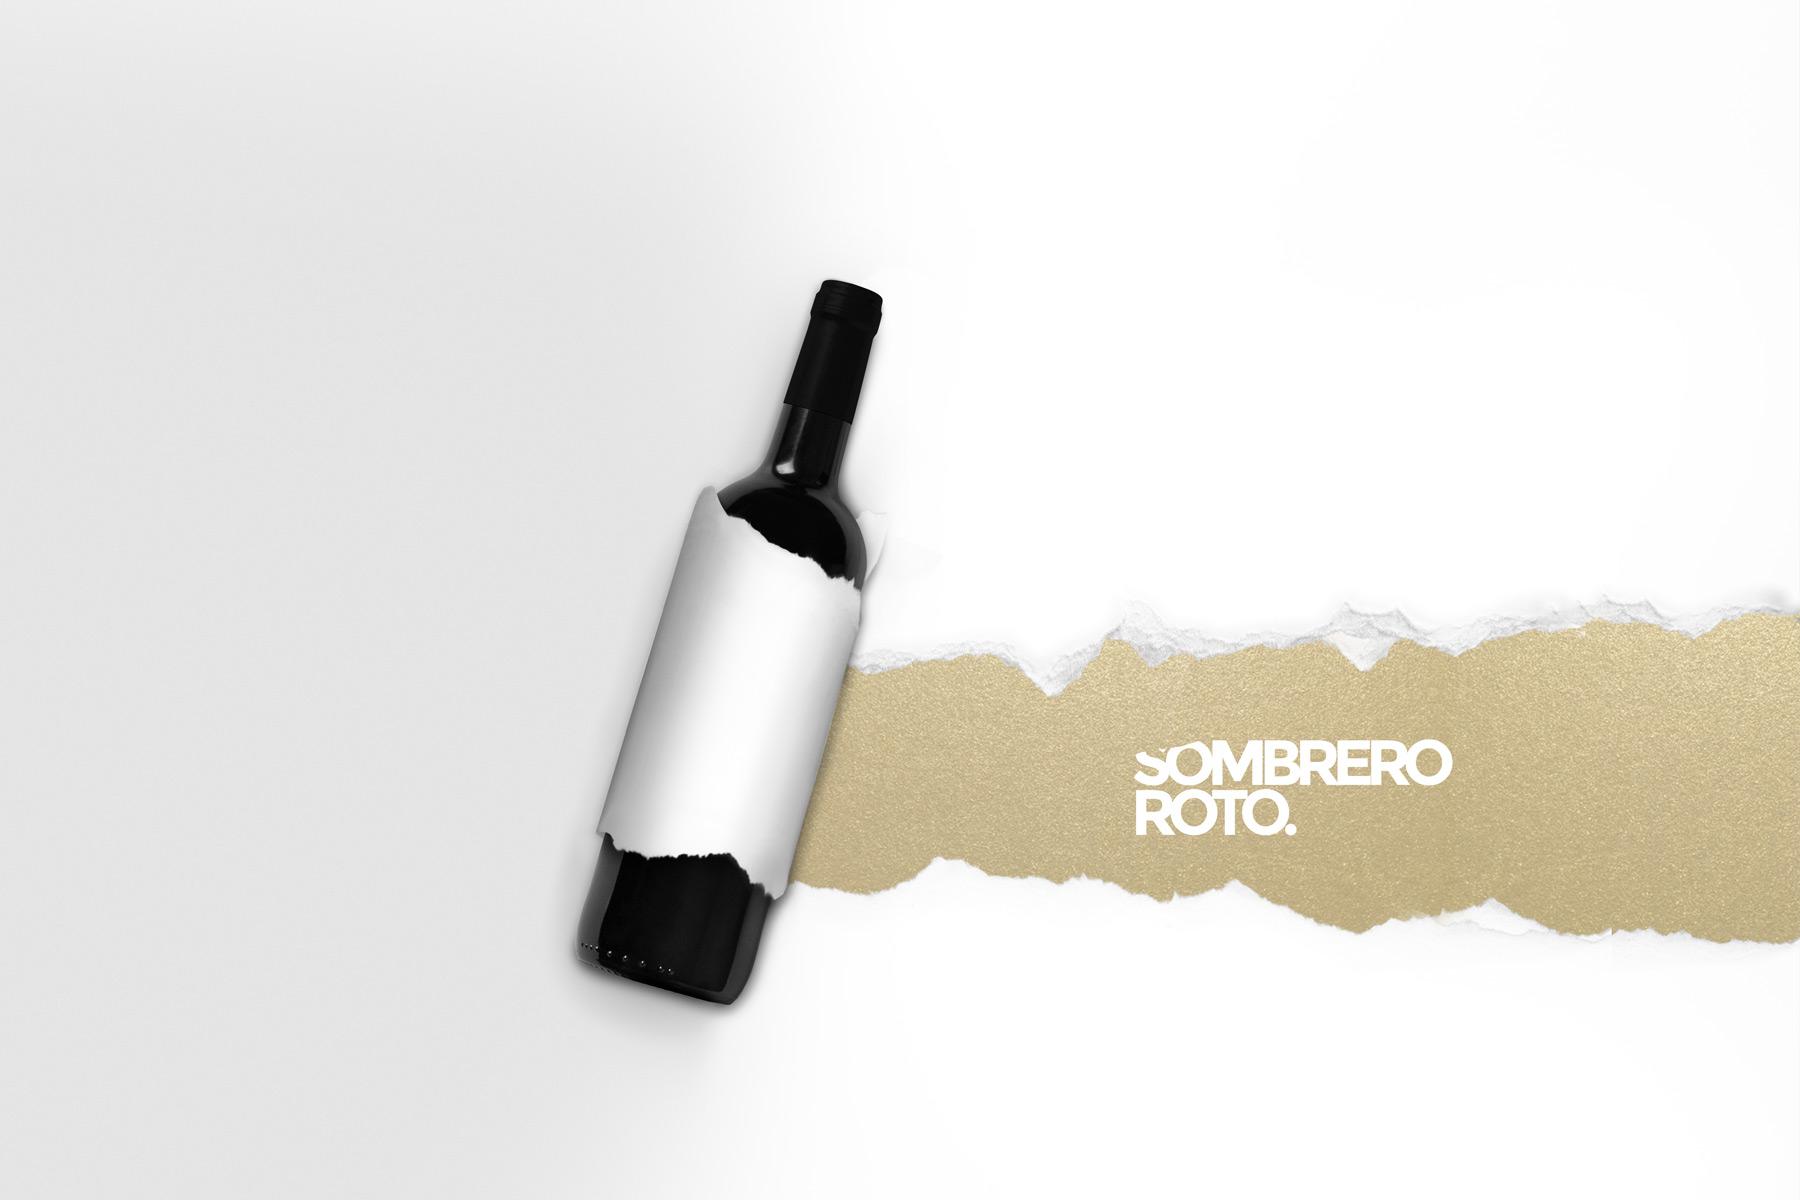 Wine-sombrero-roto-tear-paper-jorge-herrera-studio